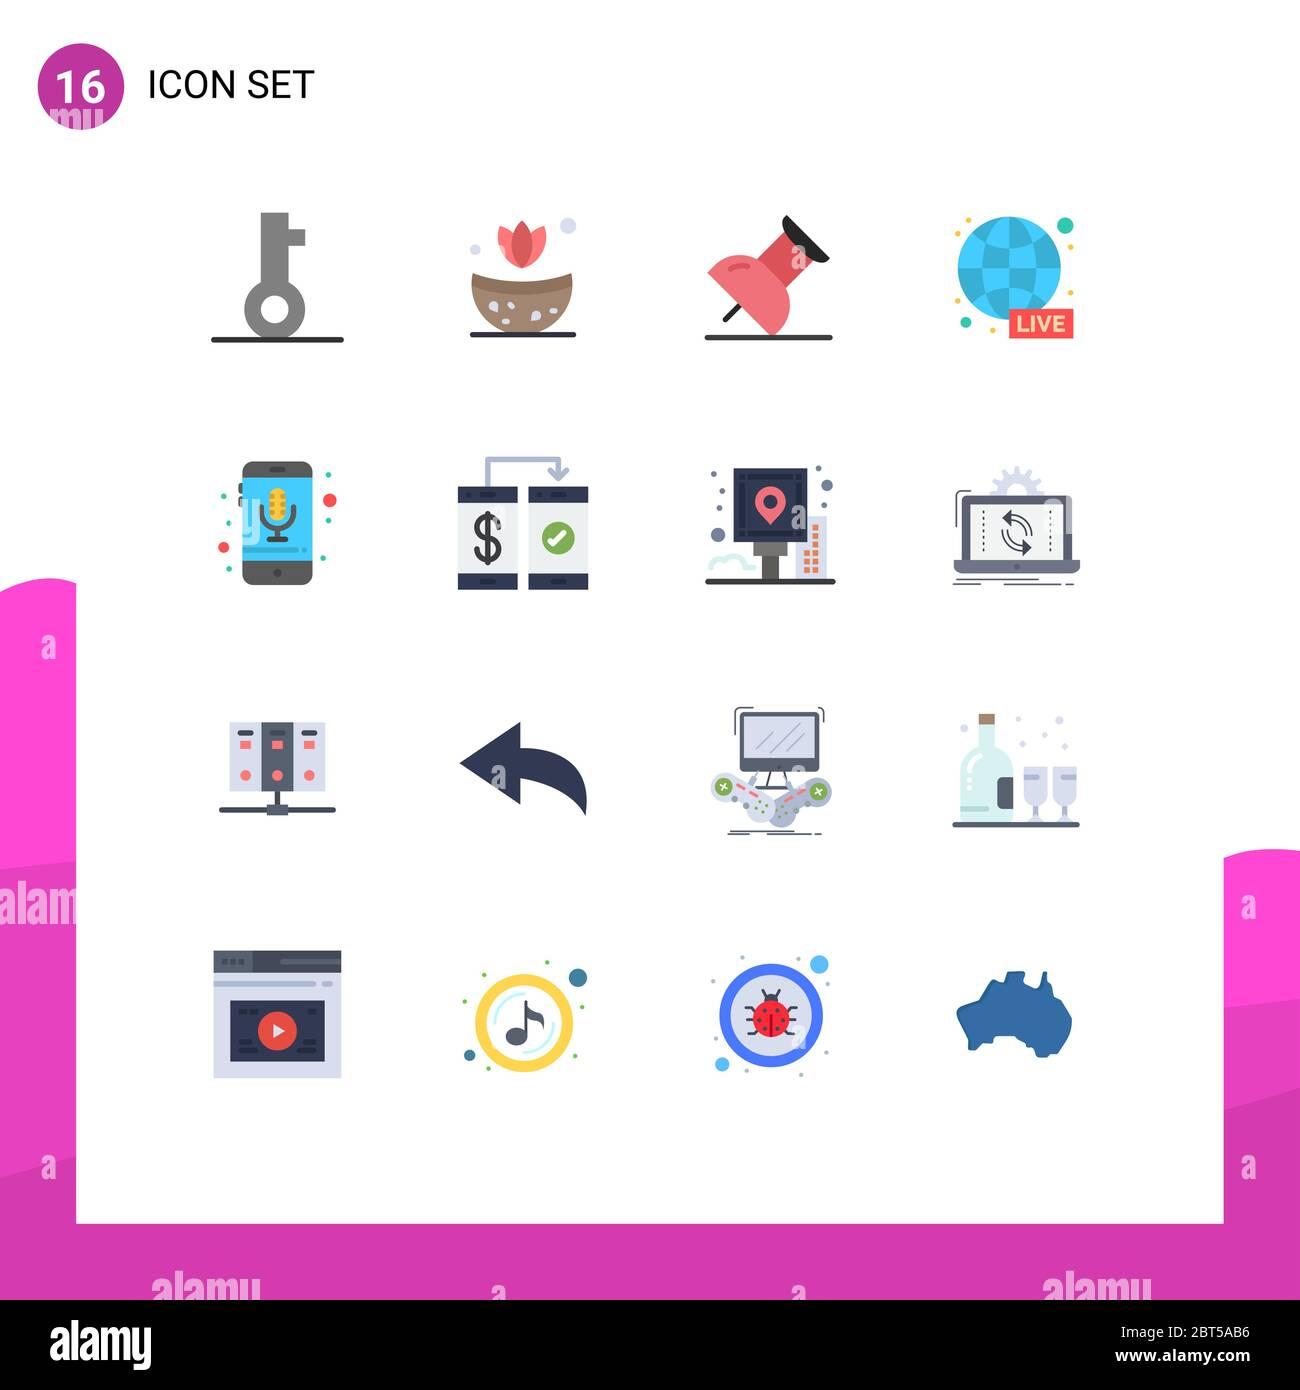 20 Universal Flat Color Signs Symbole von Smartphone, Telefon, PIN ...